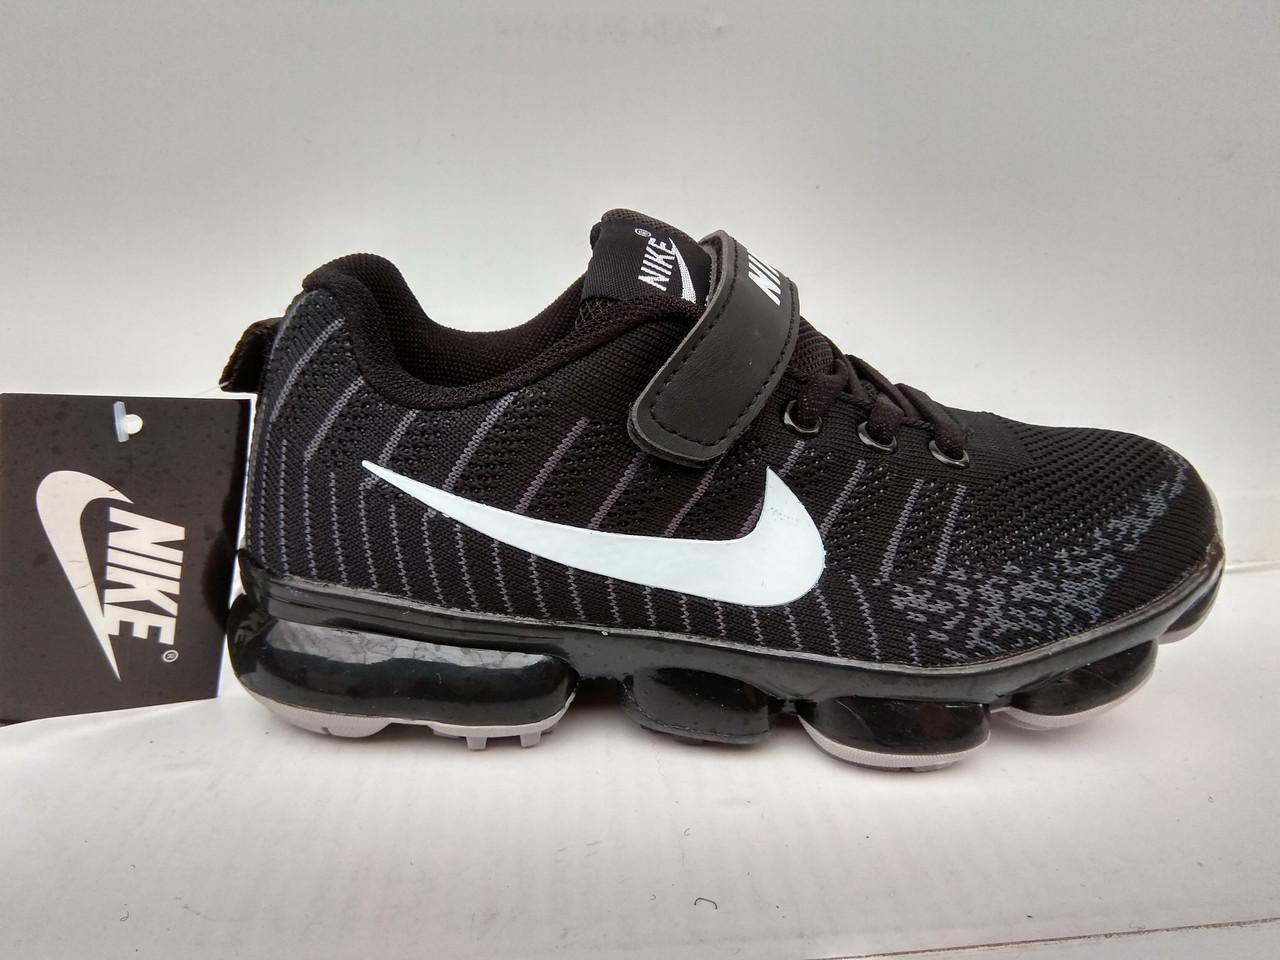 9aa54bfb1 Кроссовки Nike оптом E3540-1 (р.32-37) реплика Вьетнам, цена 425 грн ...